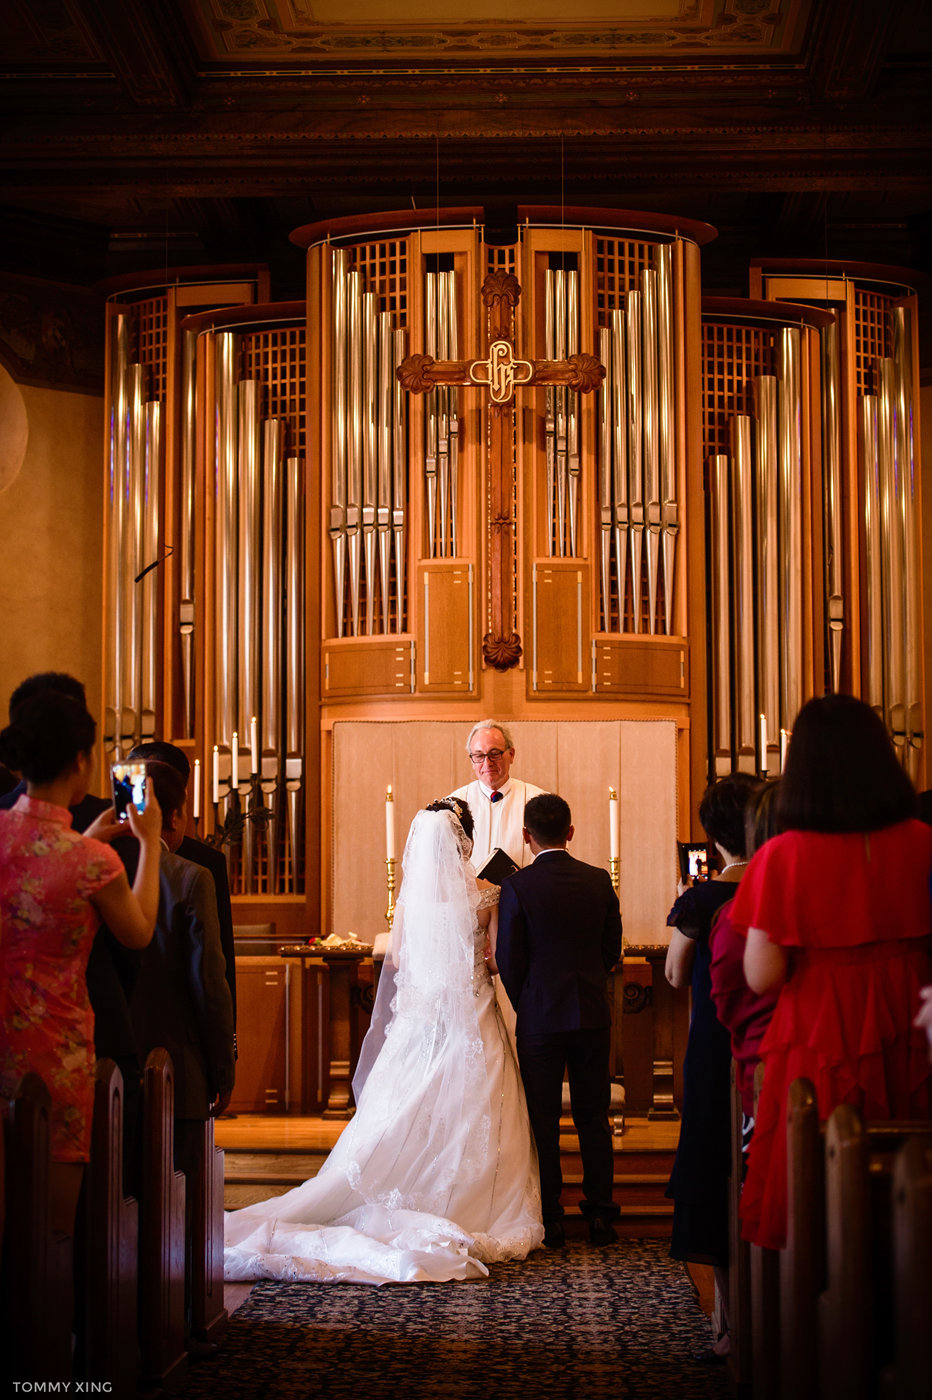 Neighborhood Church Wedding Ranho Palos Verdes Los Angeles Tommy Xing Photography 洛杉矶旧金山婚礼婚纱照摄影师 069.jpg